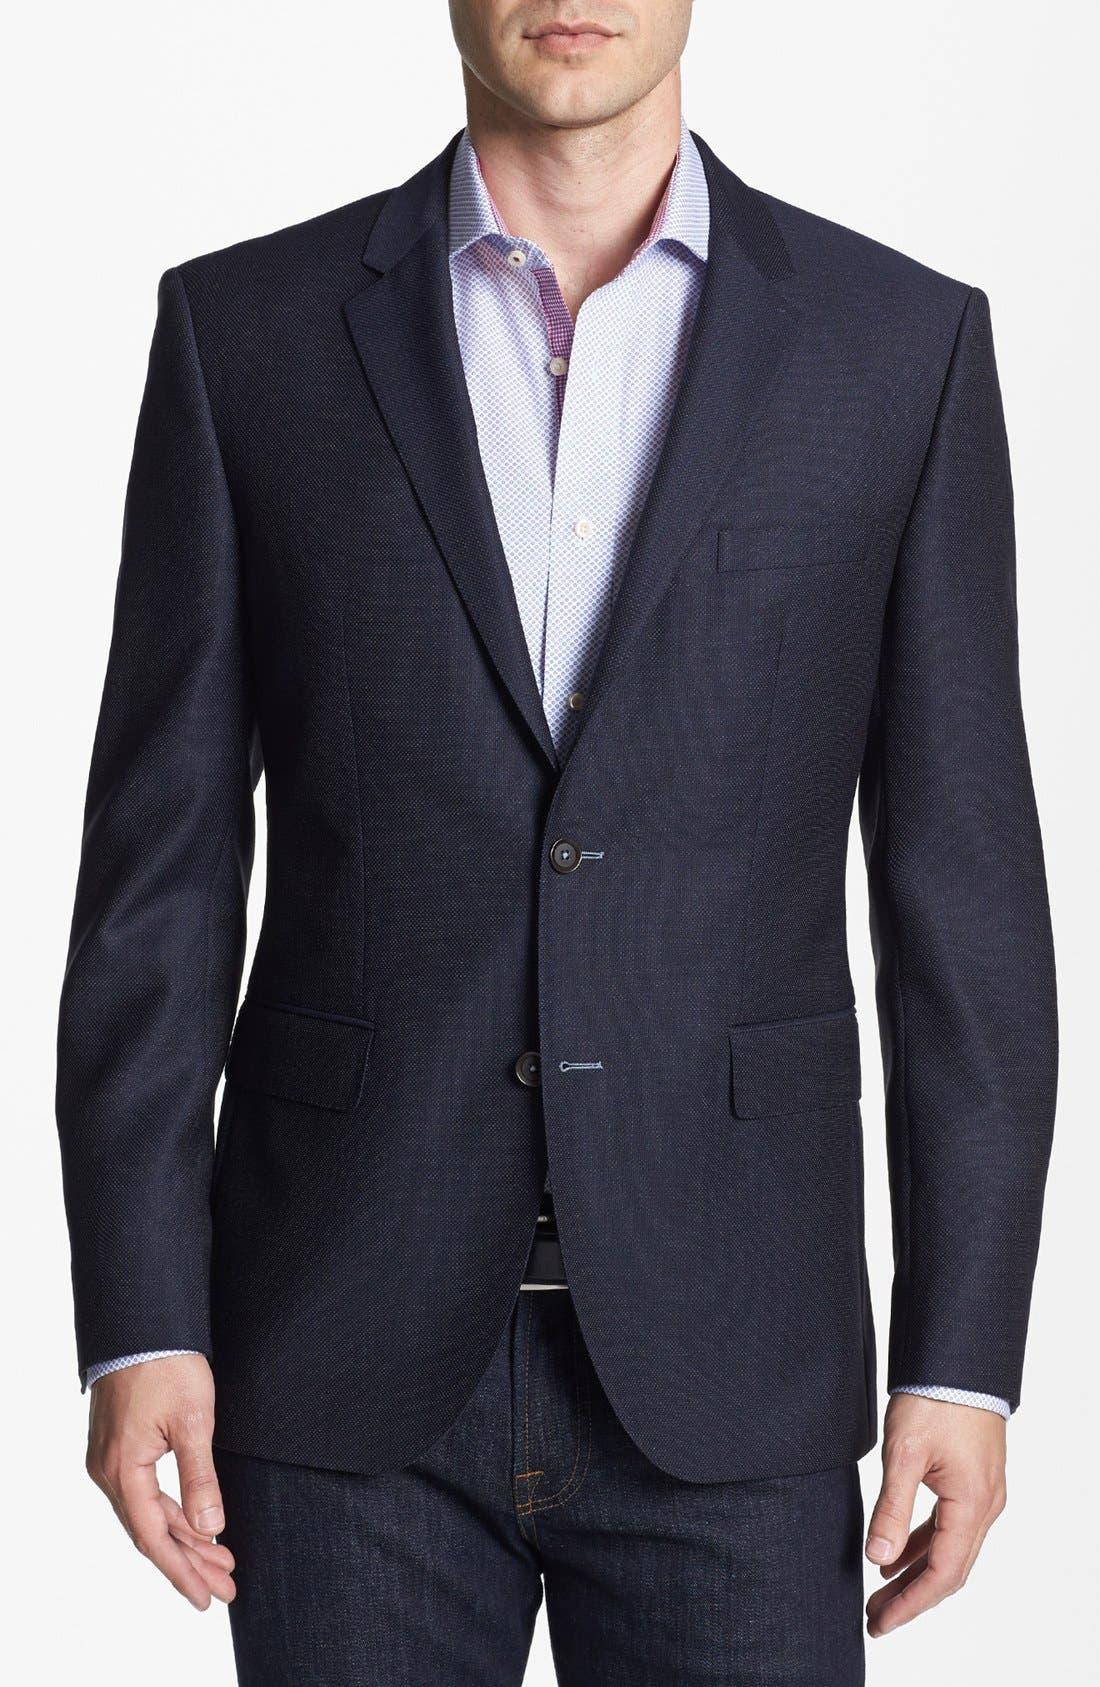 Alternate Image 1 Selected - BOSS Black 'The Keys' Trim Fit Wool Blazer